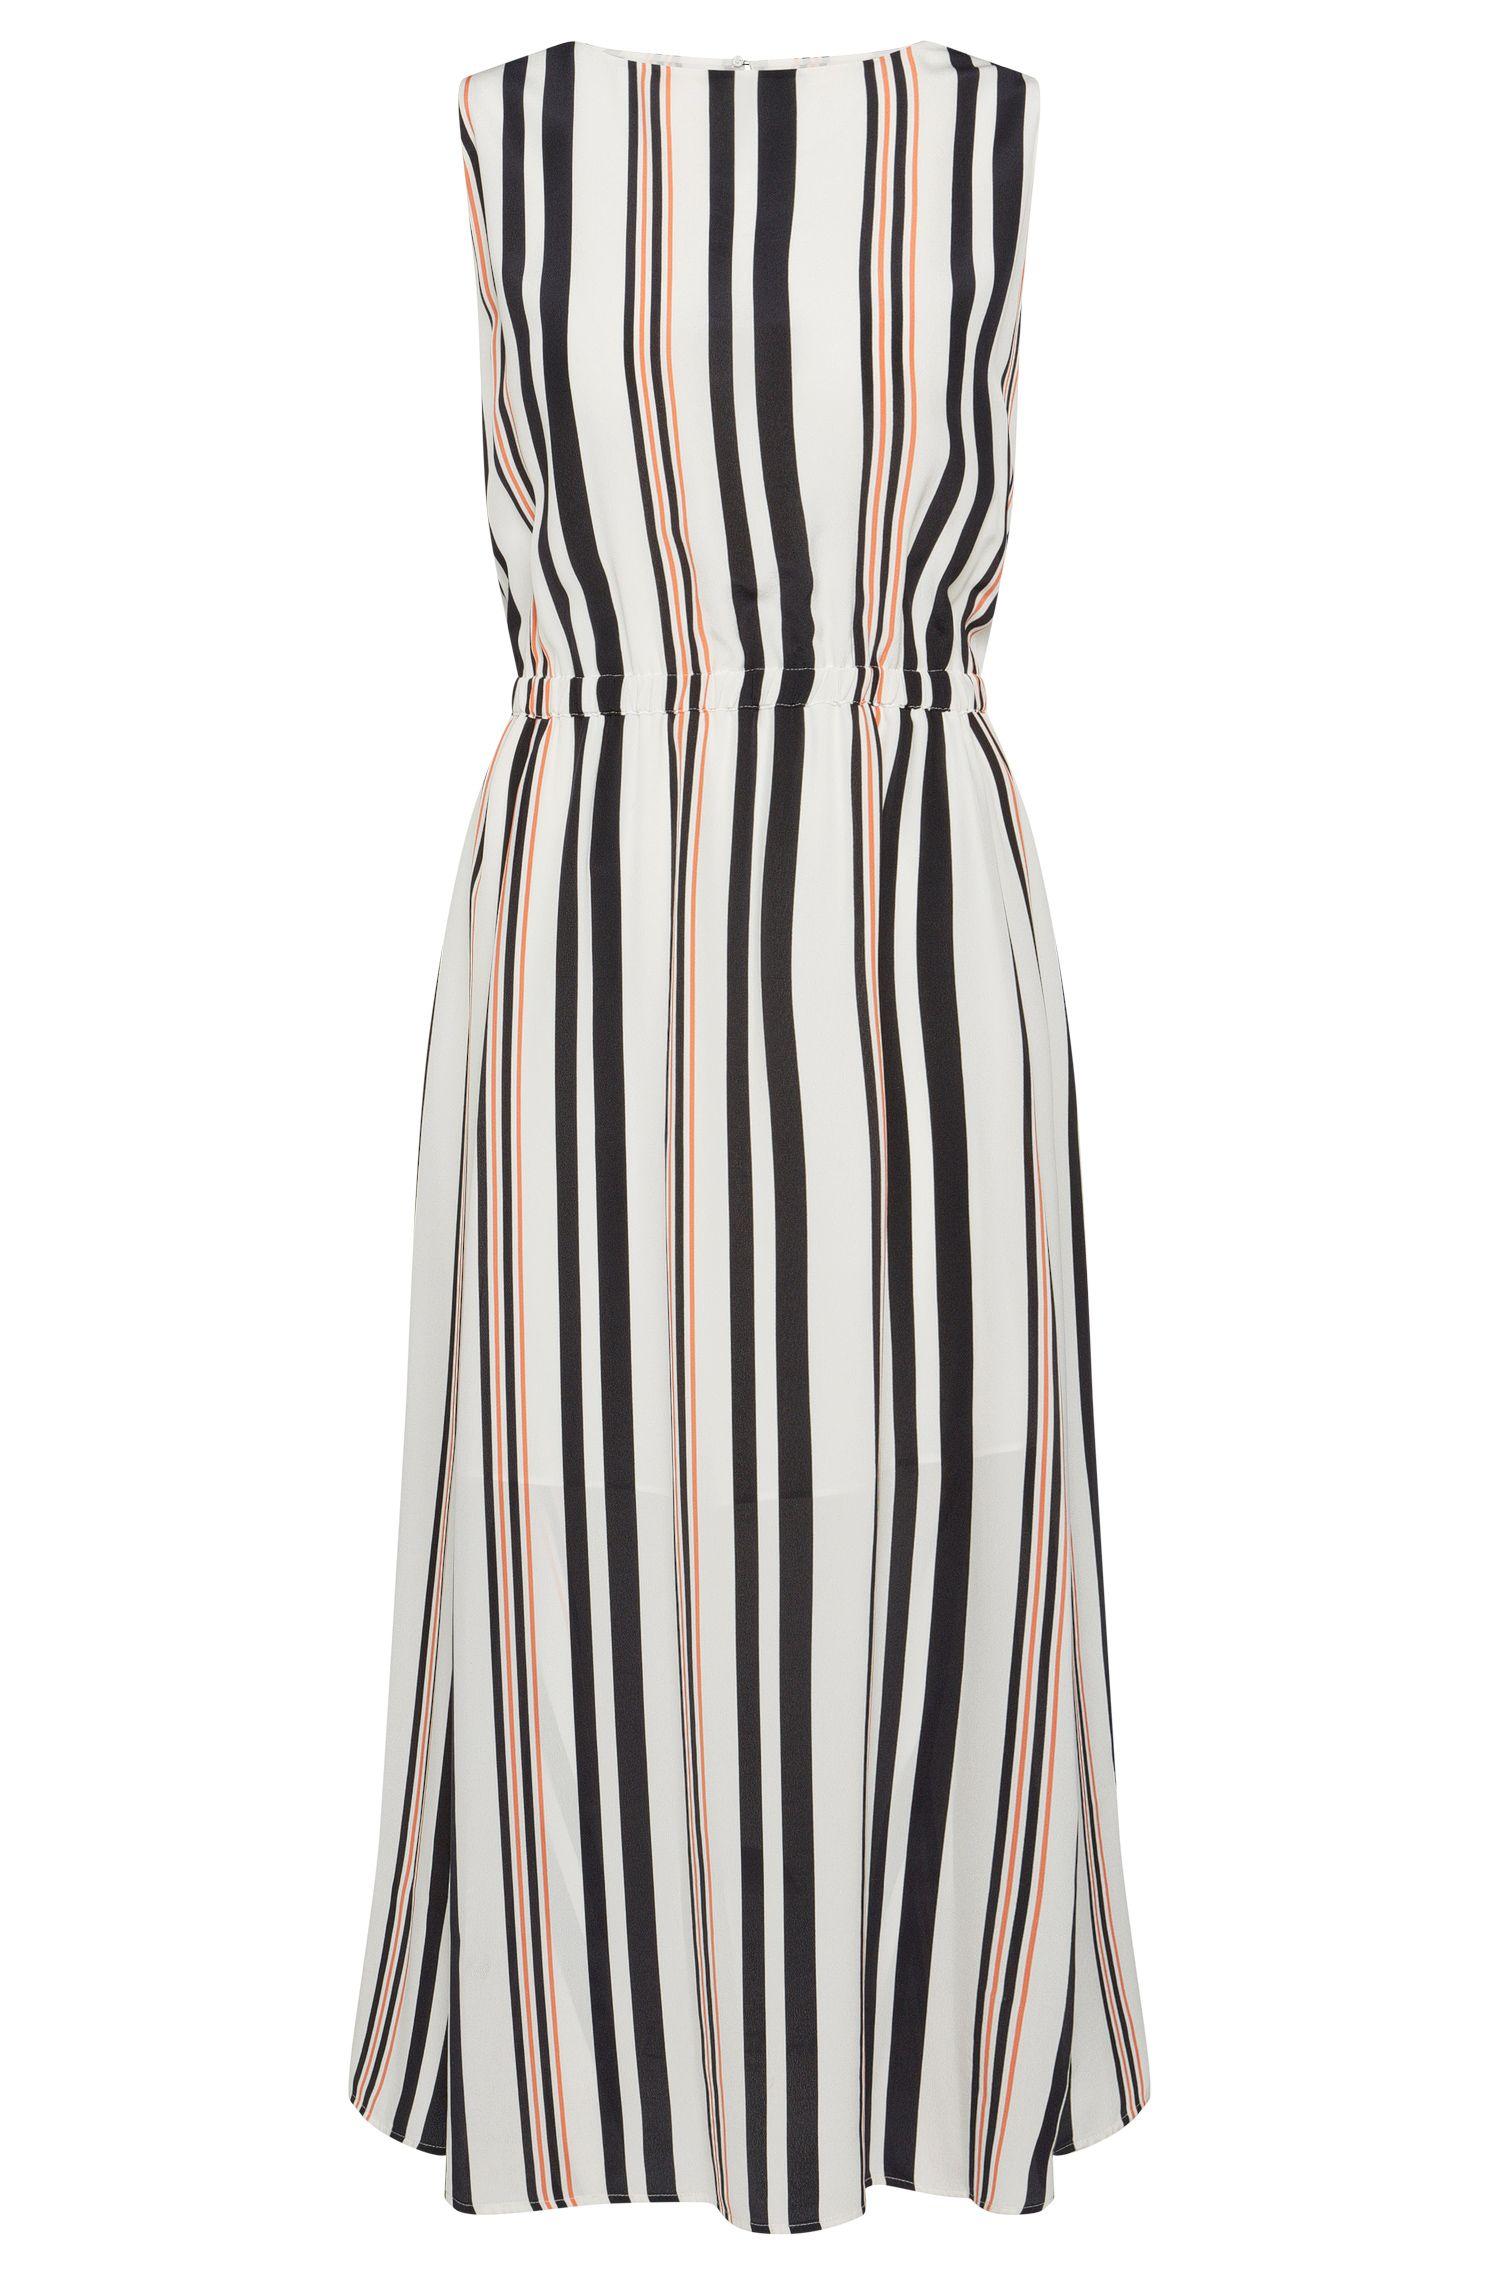 Silk A-Line Striped Dress | Hemsy